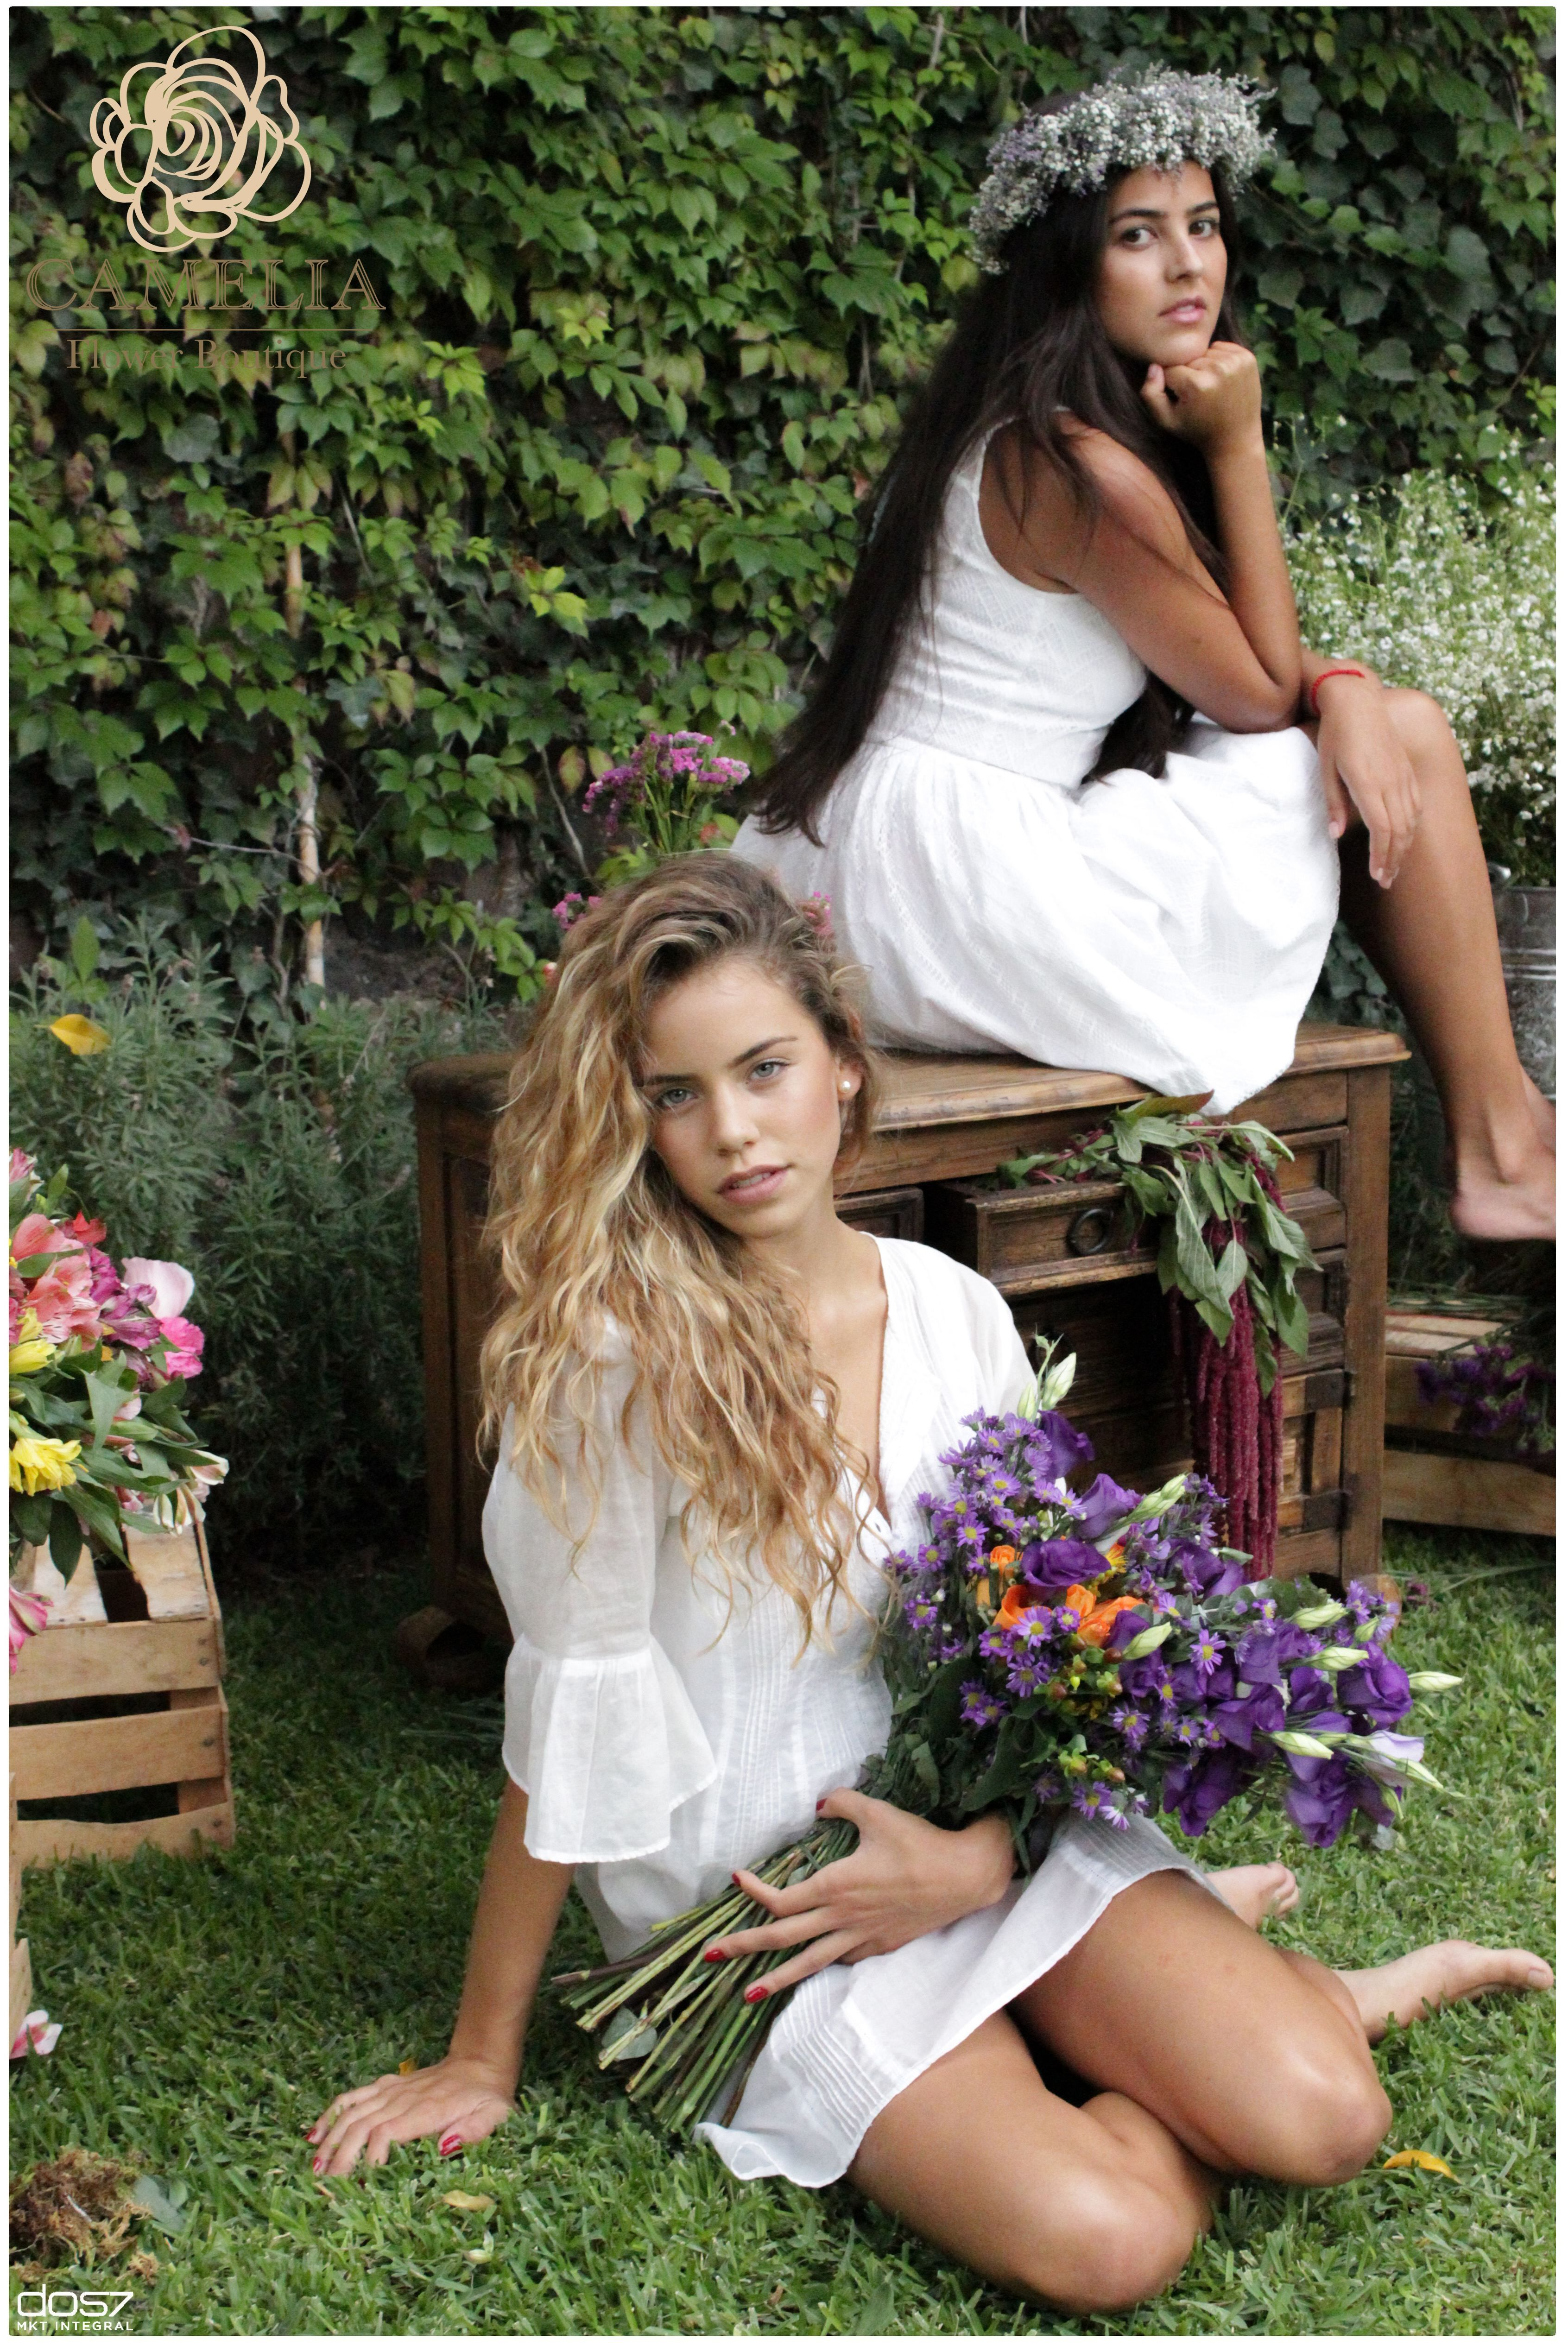 Corona De Flores Para La Cabeza Flores Verano By Camelia Flower Boutique White Dress Hair Accessories Wedding